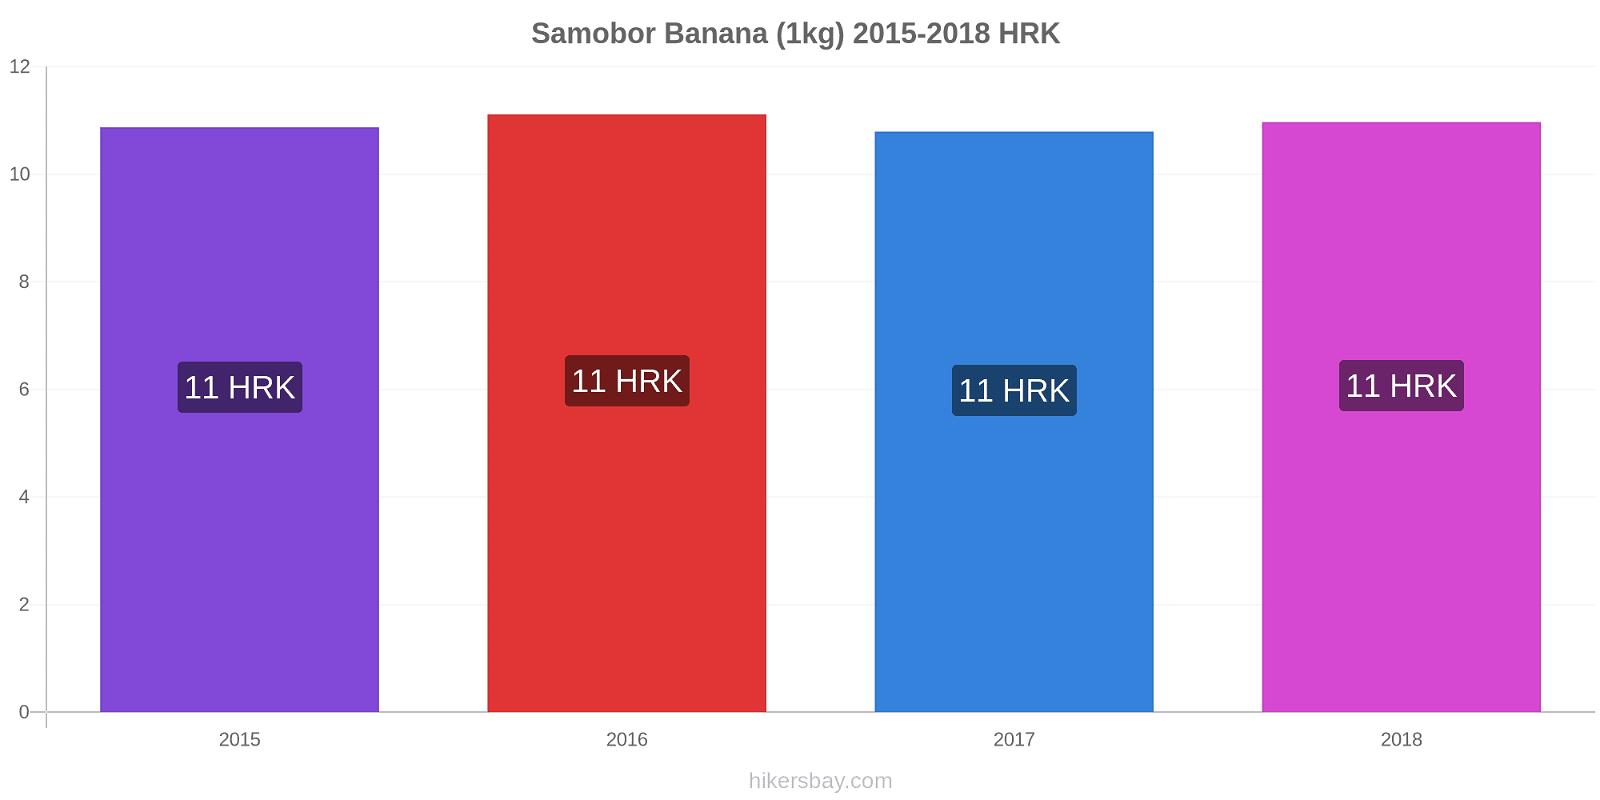 Samobor modificări de preț Banana (1kg) hikersbay.com